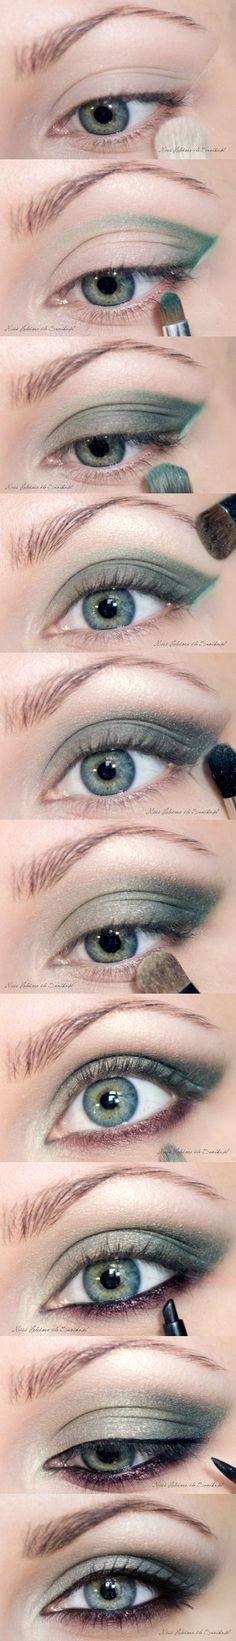 Emerald Smokey Eyes - Eye Make Up Tutorial